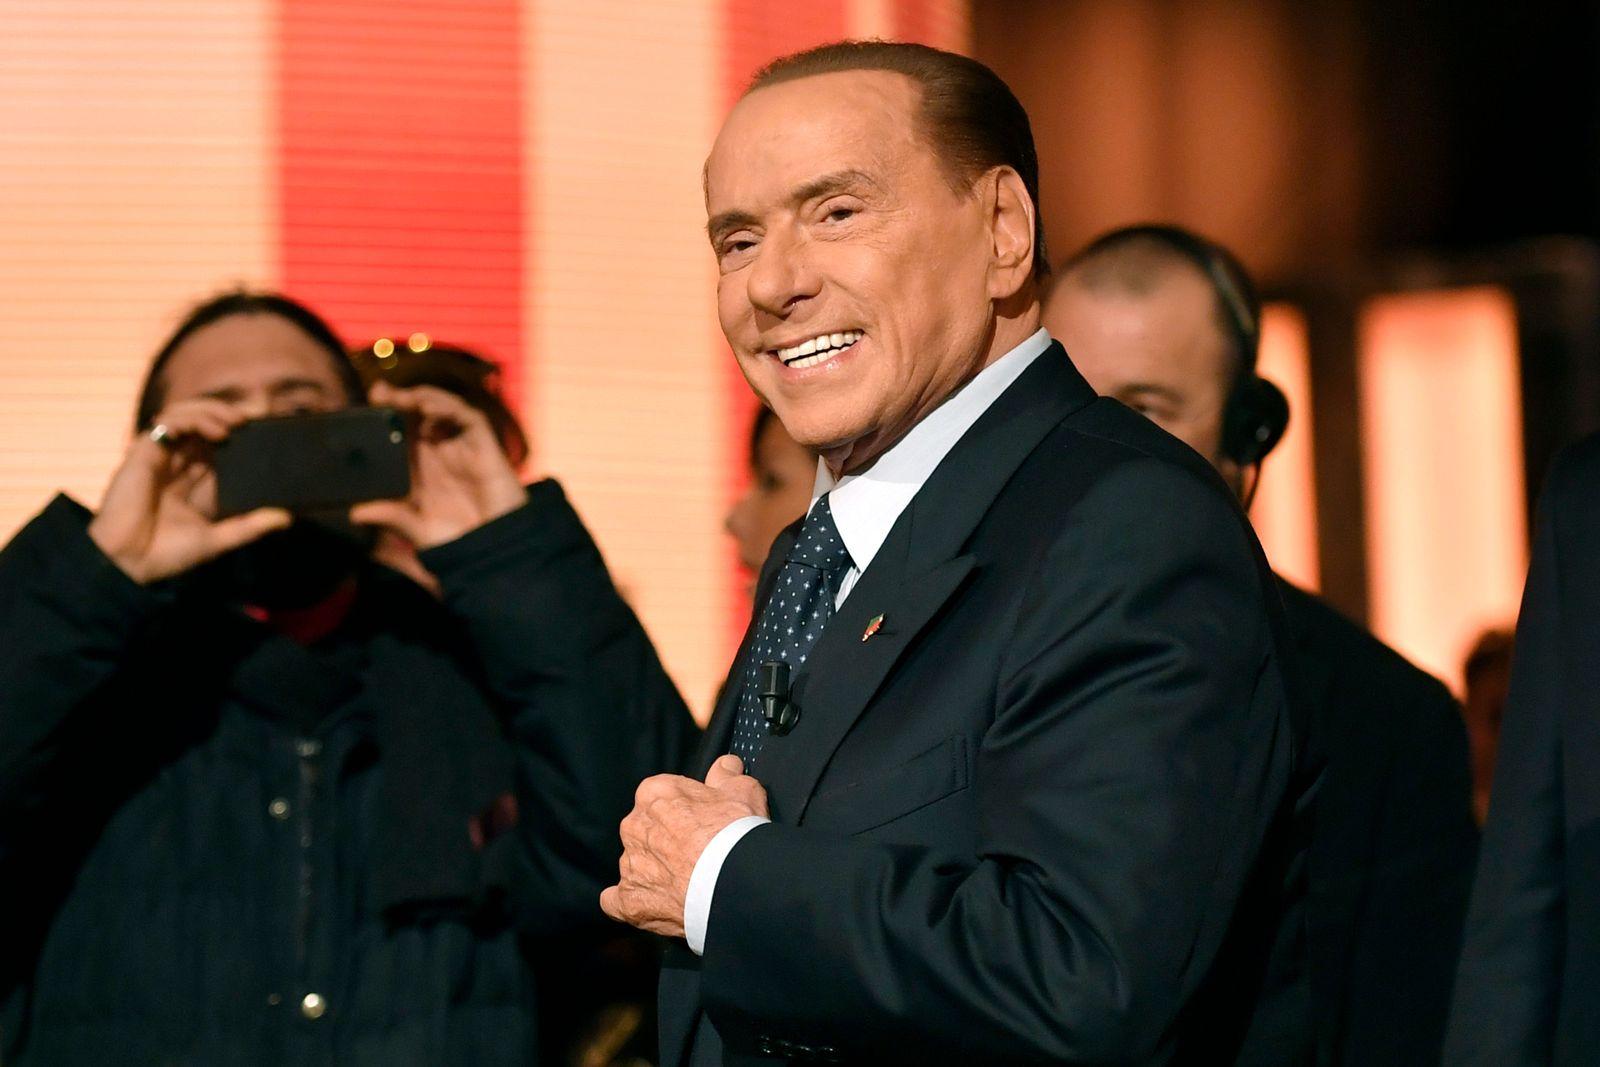 ITALY-POLITICS-BERLUSCONI-PARTY-FORZA-ITALIA